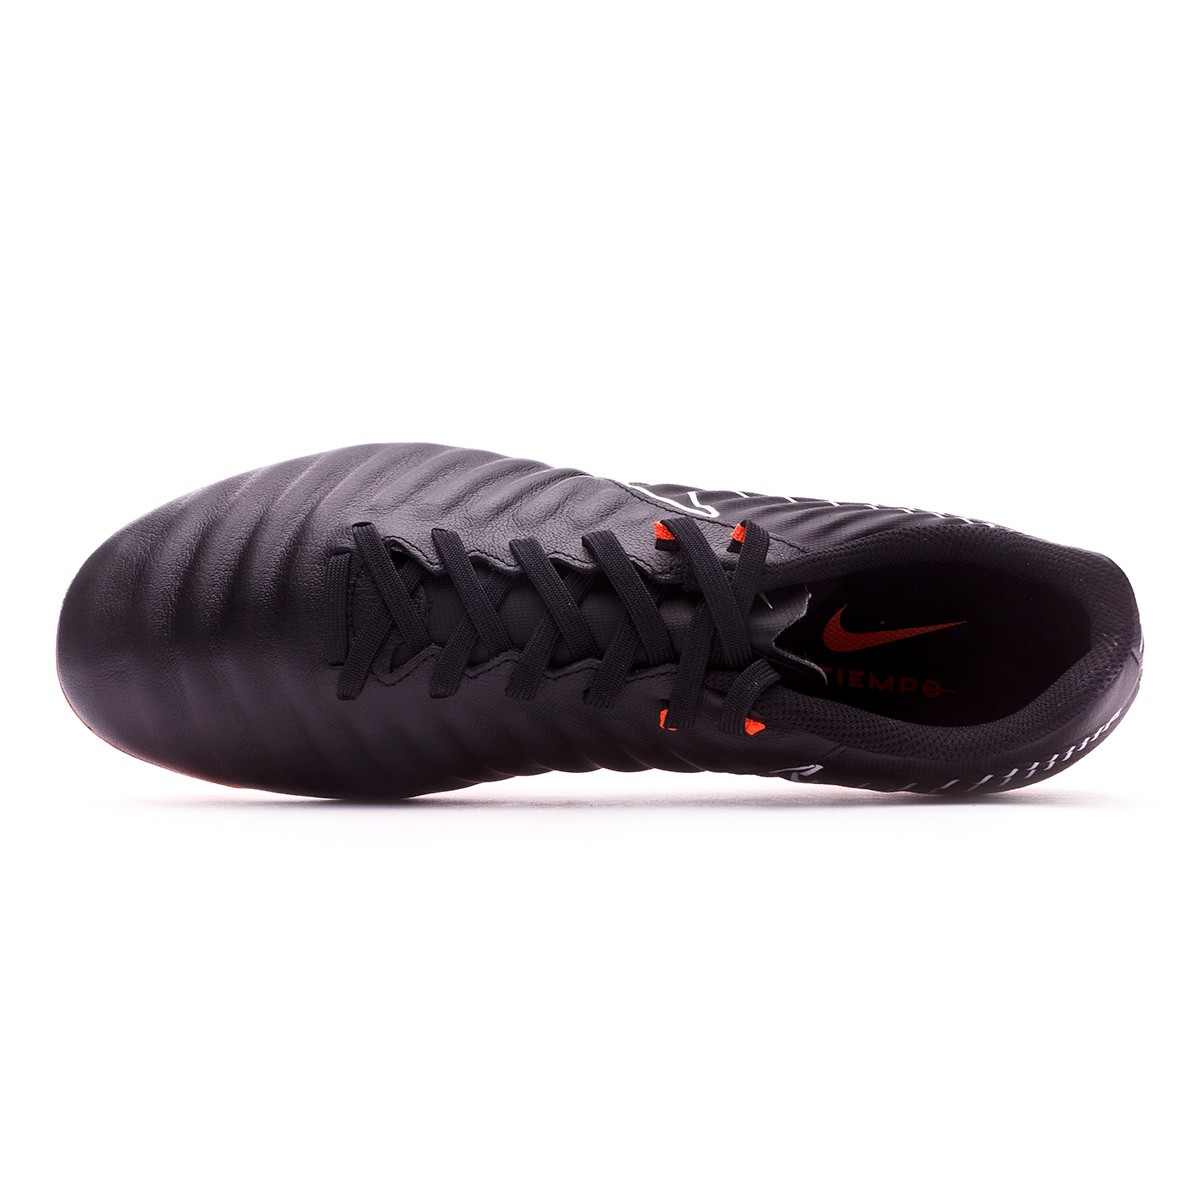 3a9be9c76b41a Bota de fútbol Nike Tiempo Legend VII Academy FG Black-Total orange-White -  Tienda de fútbol Fútbol Emotion